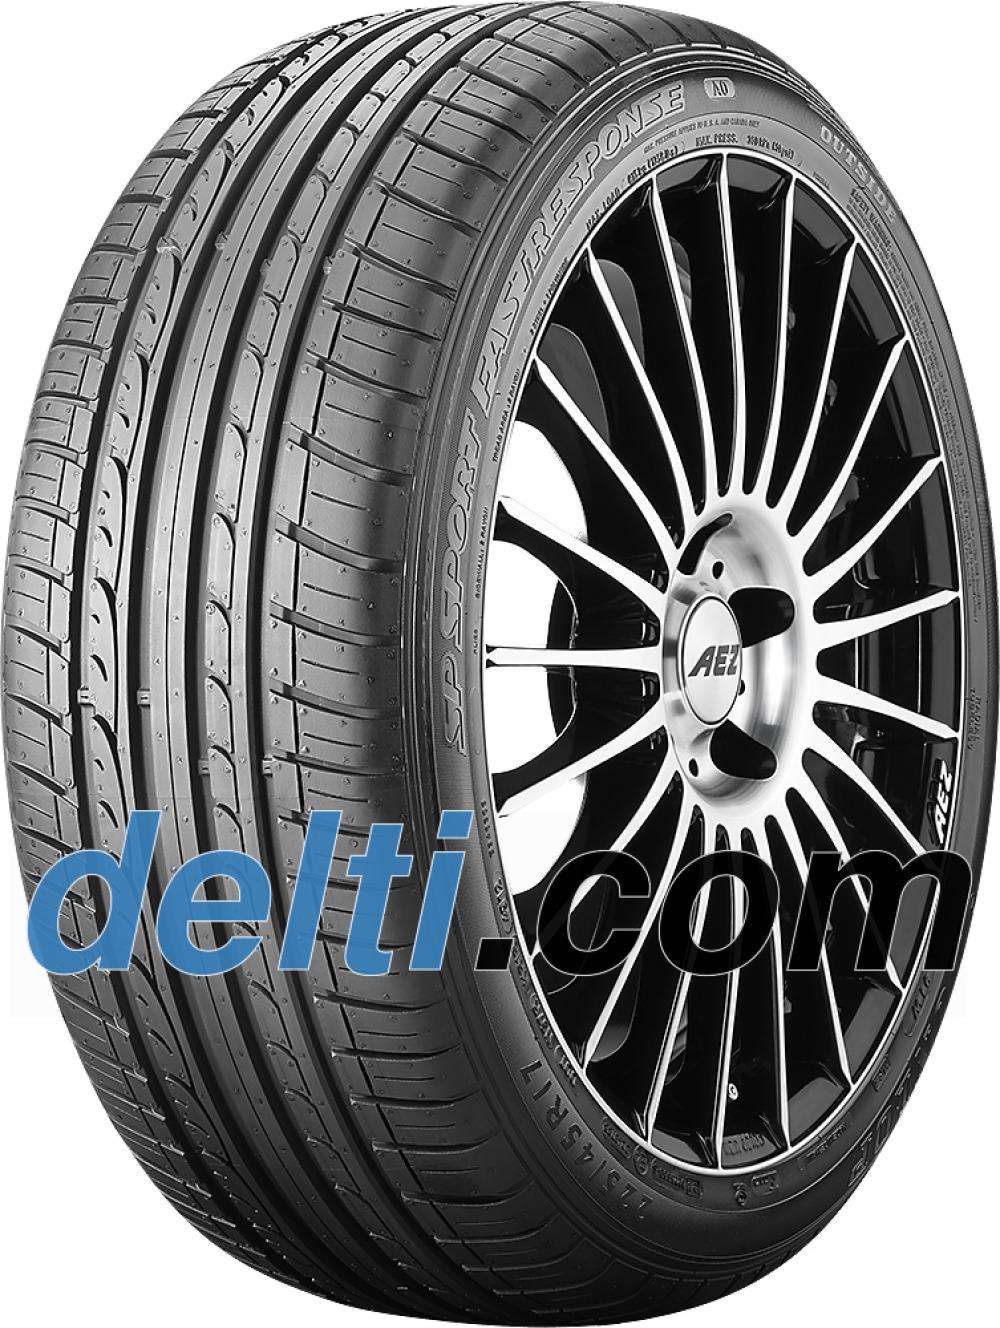 Dunlop SP Sport FastResponse ( 225/45 R17 91W med fälg skyddslist (MFS) )